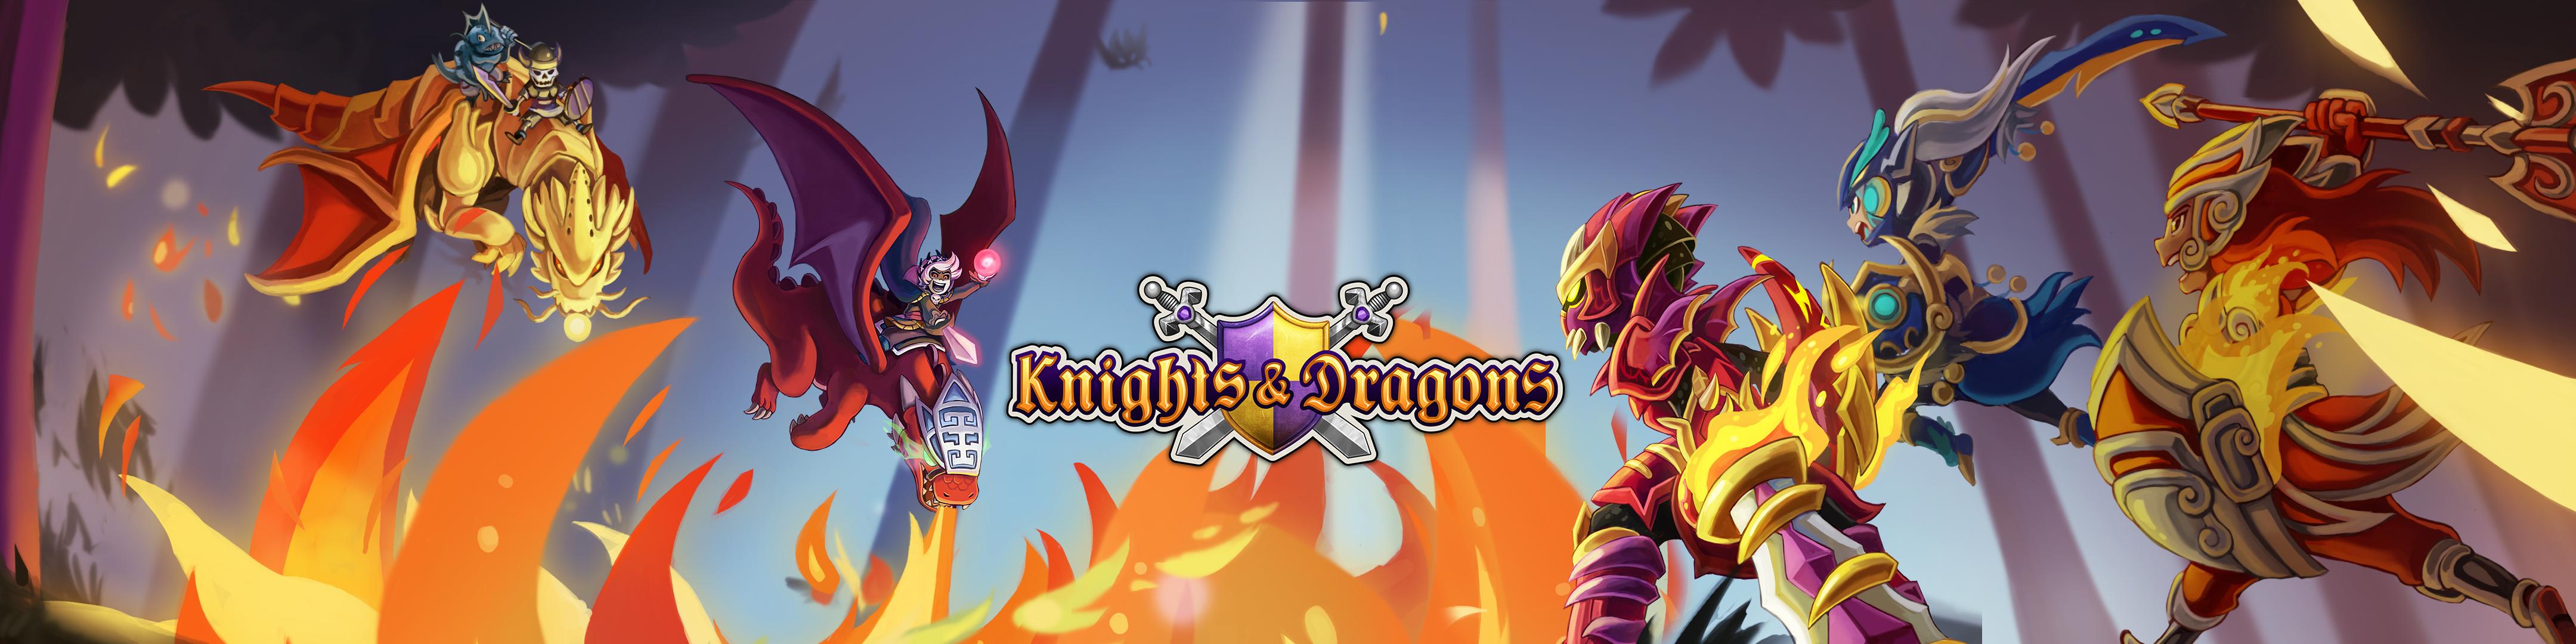 Knights & Dragons - RPG - Revenue & Download estimates